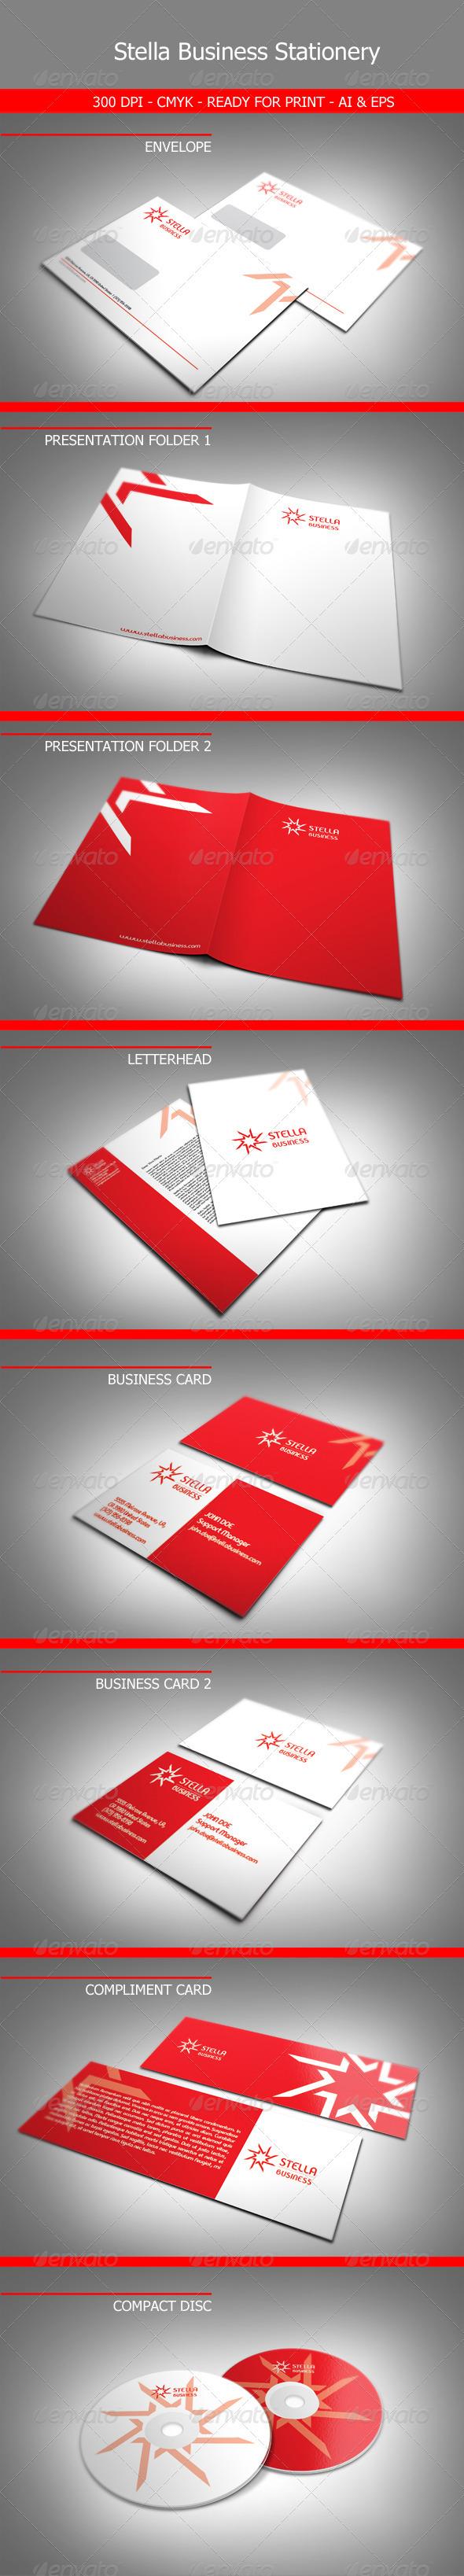 GraphicRiver Stella Business Stationery 2129452